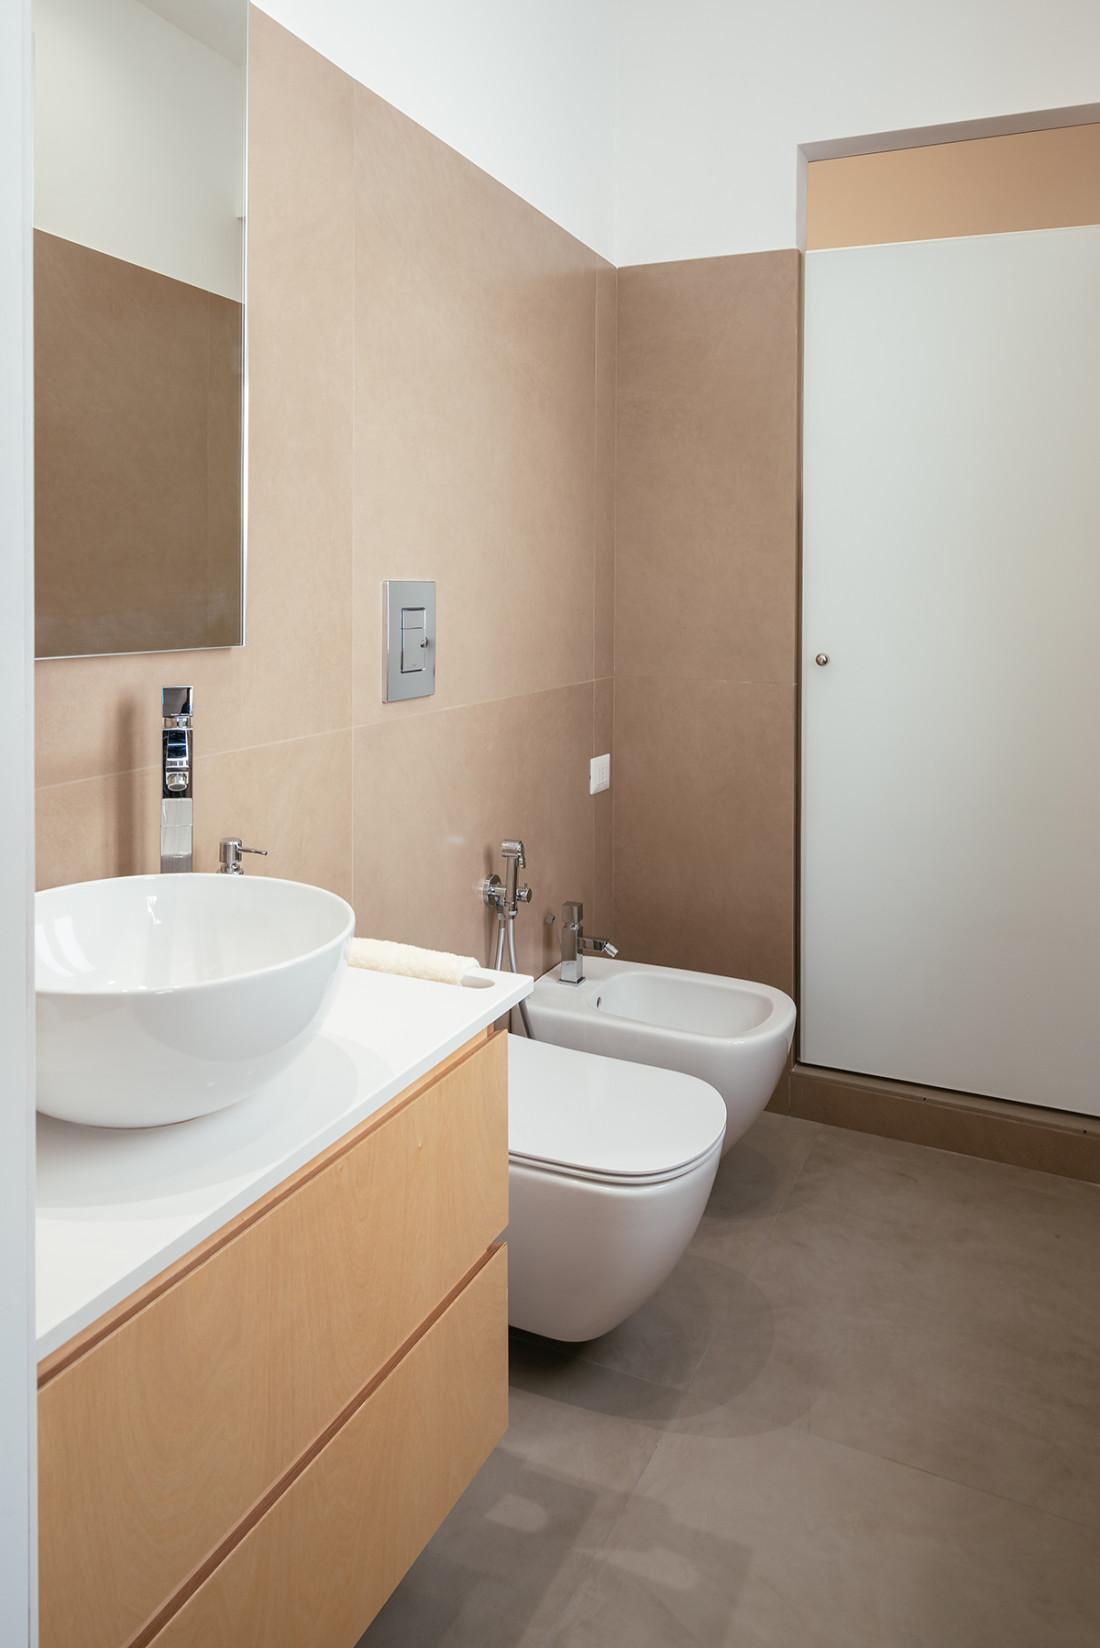 Casa RL. Bathroom